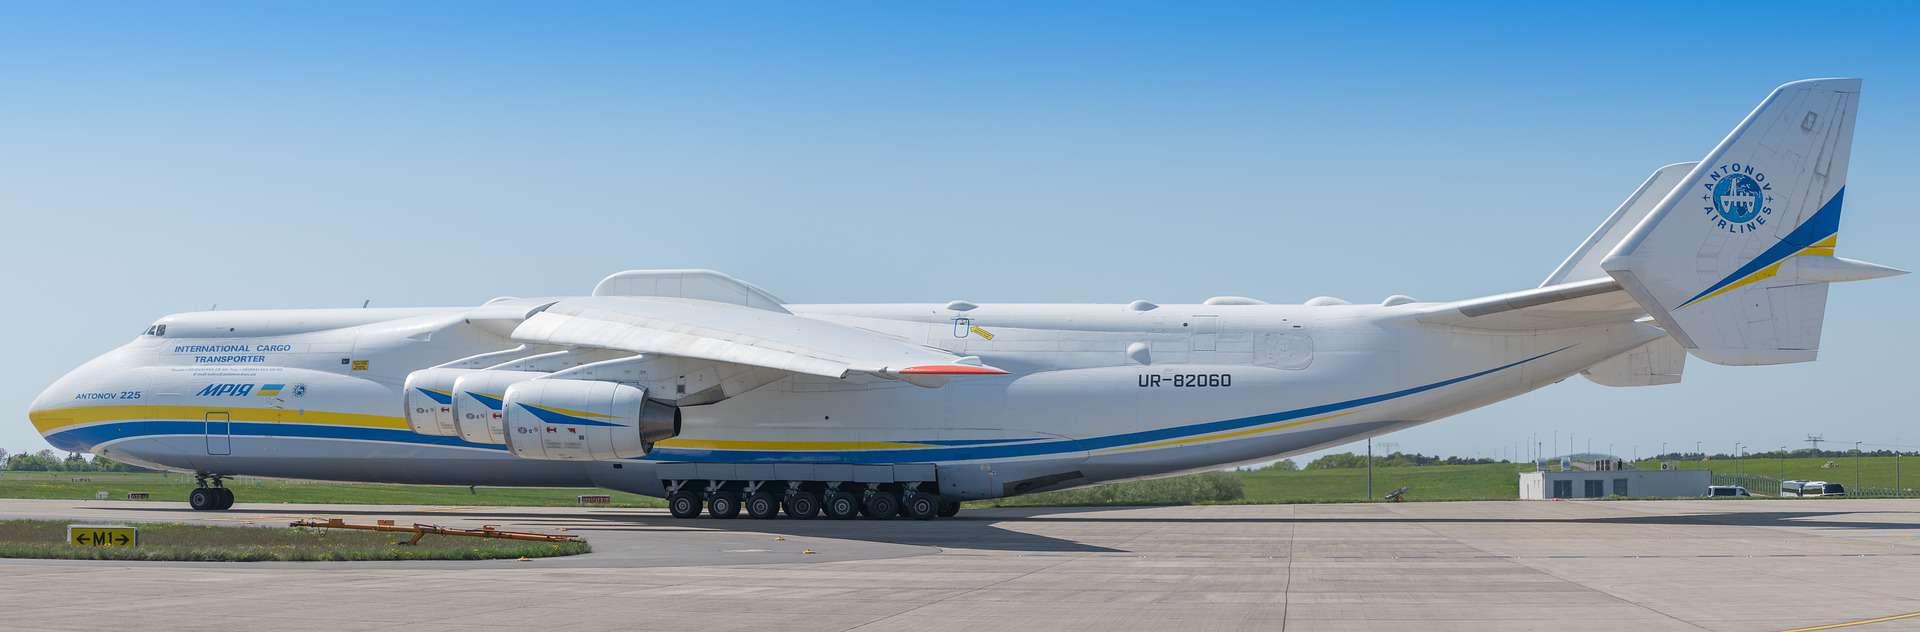 Antonov air cargo charter aircraft